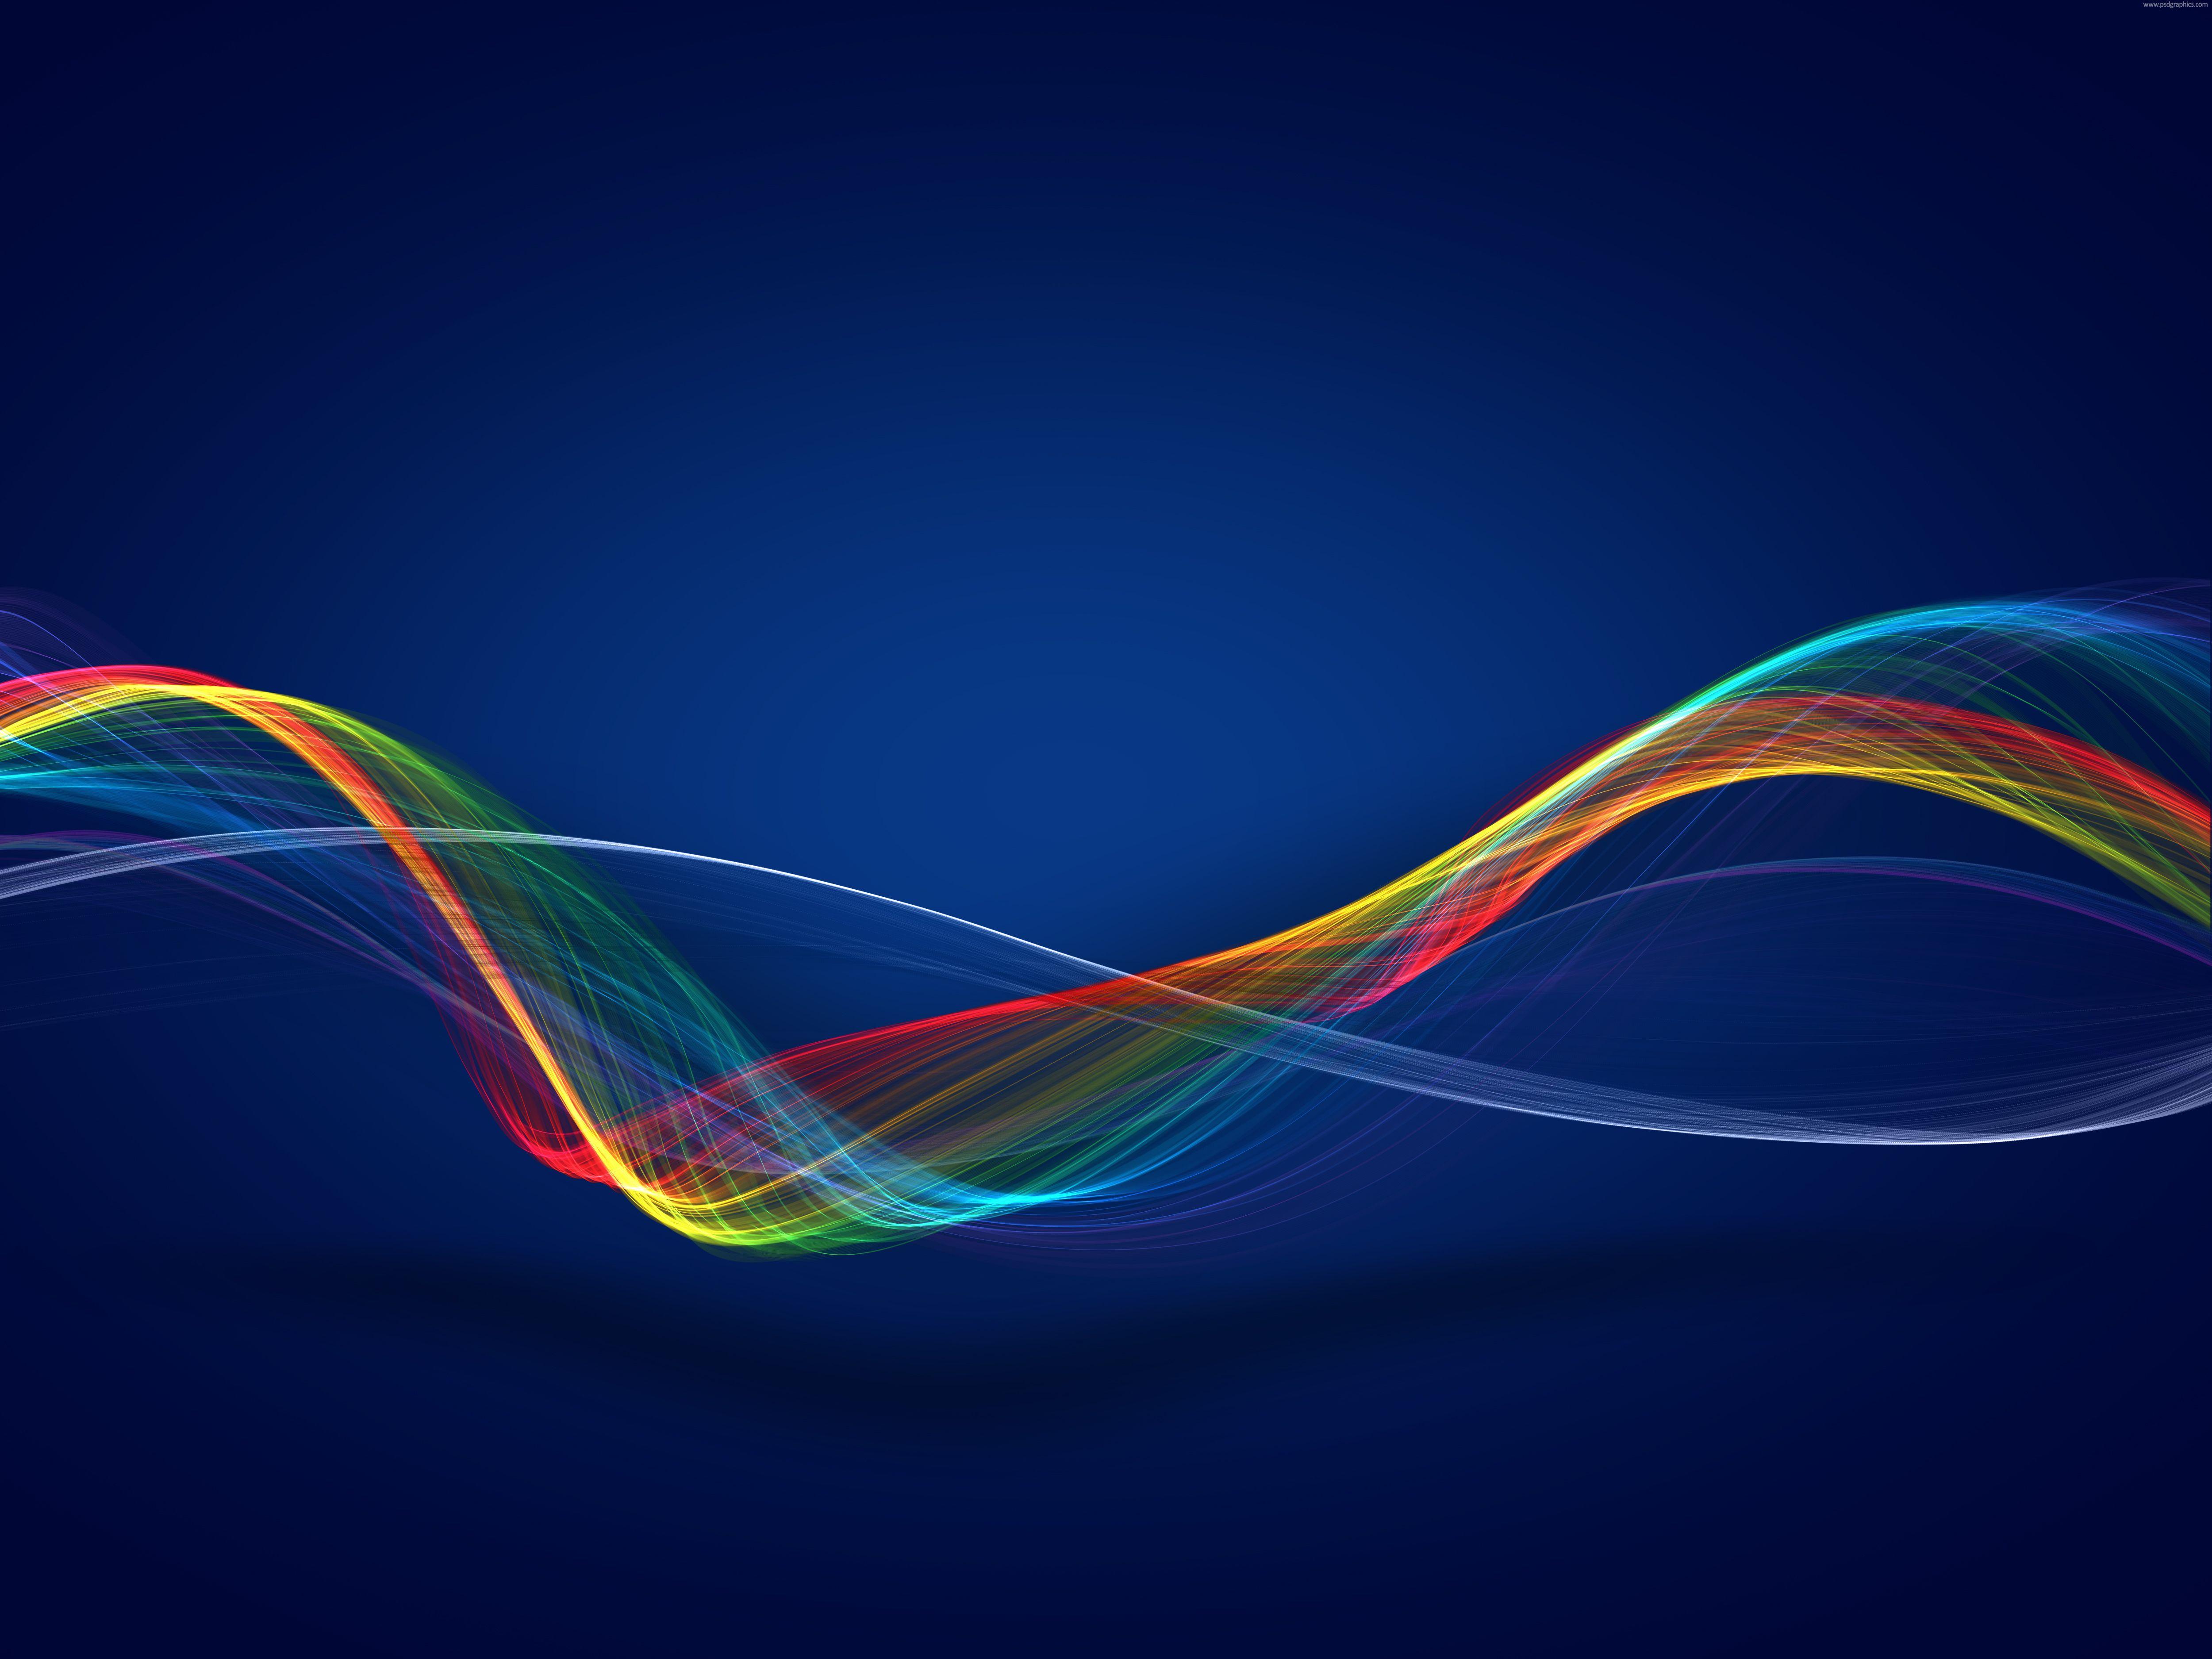 Dynamic Waves Design Psdgraphics